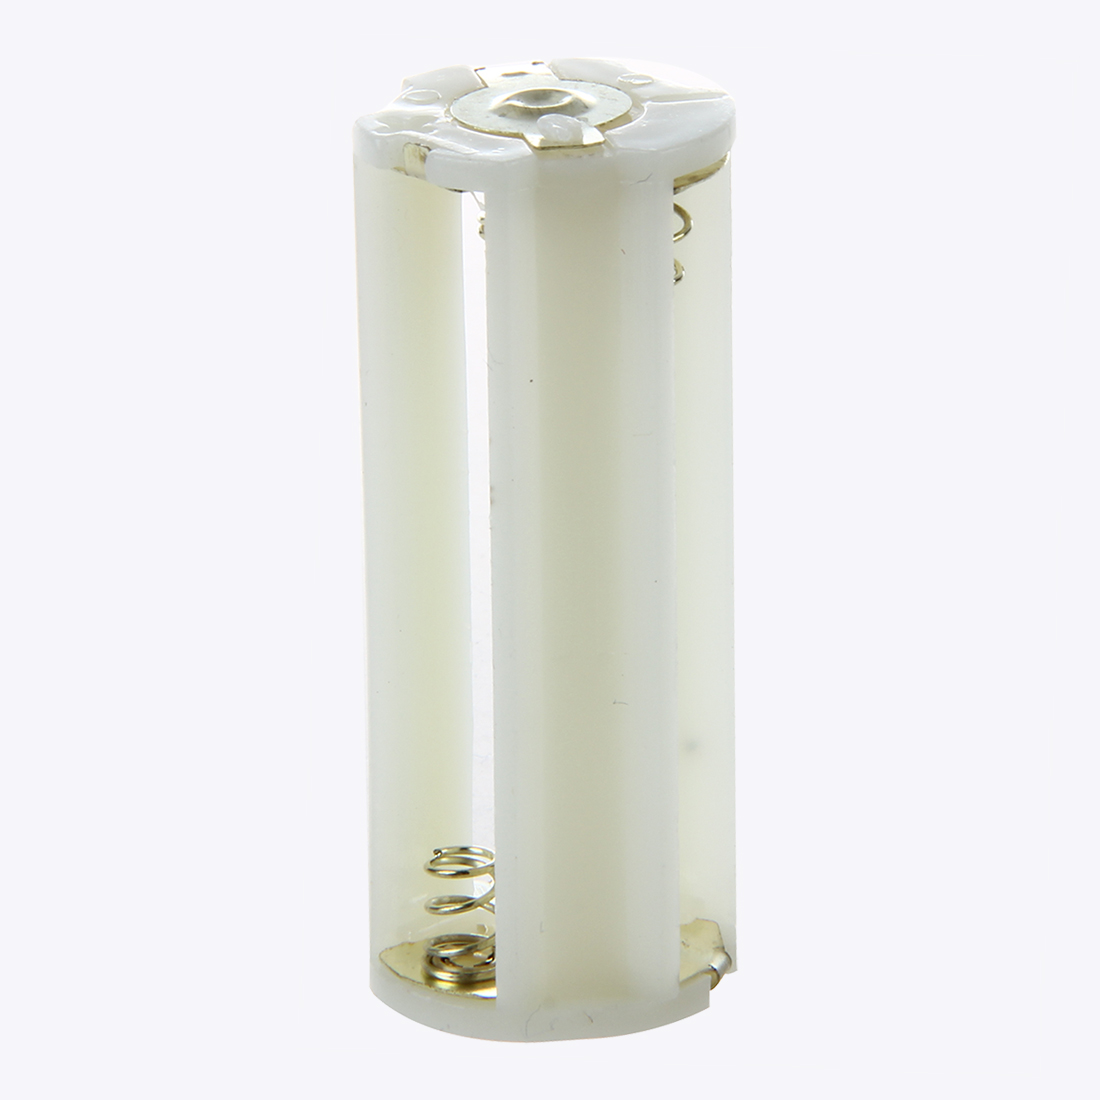 3Pcs 18650 Battery Tube Holder Plastic Case Adaptor For Flashlight Torch LamCWIC